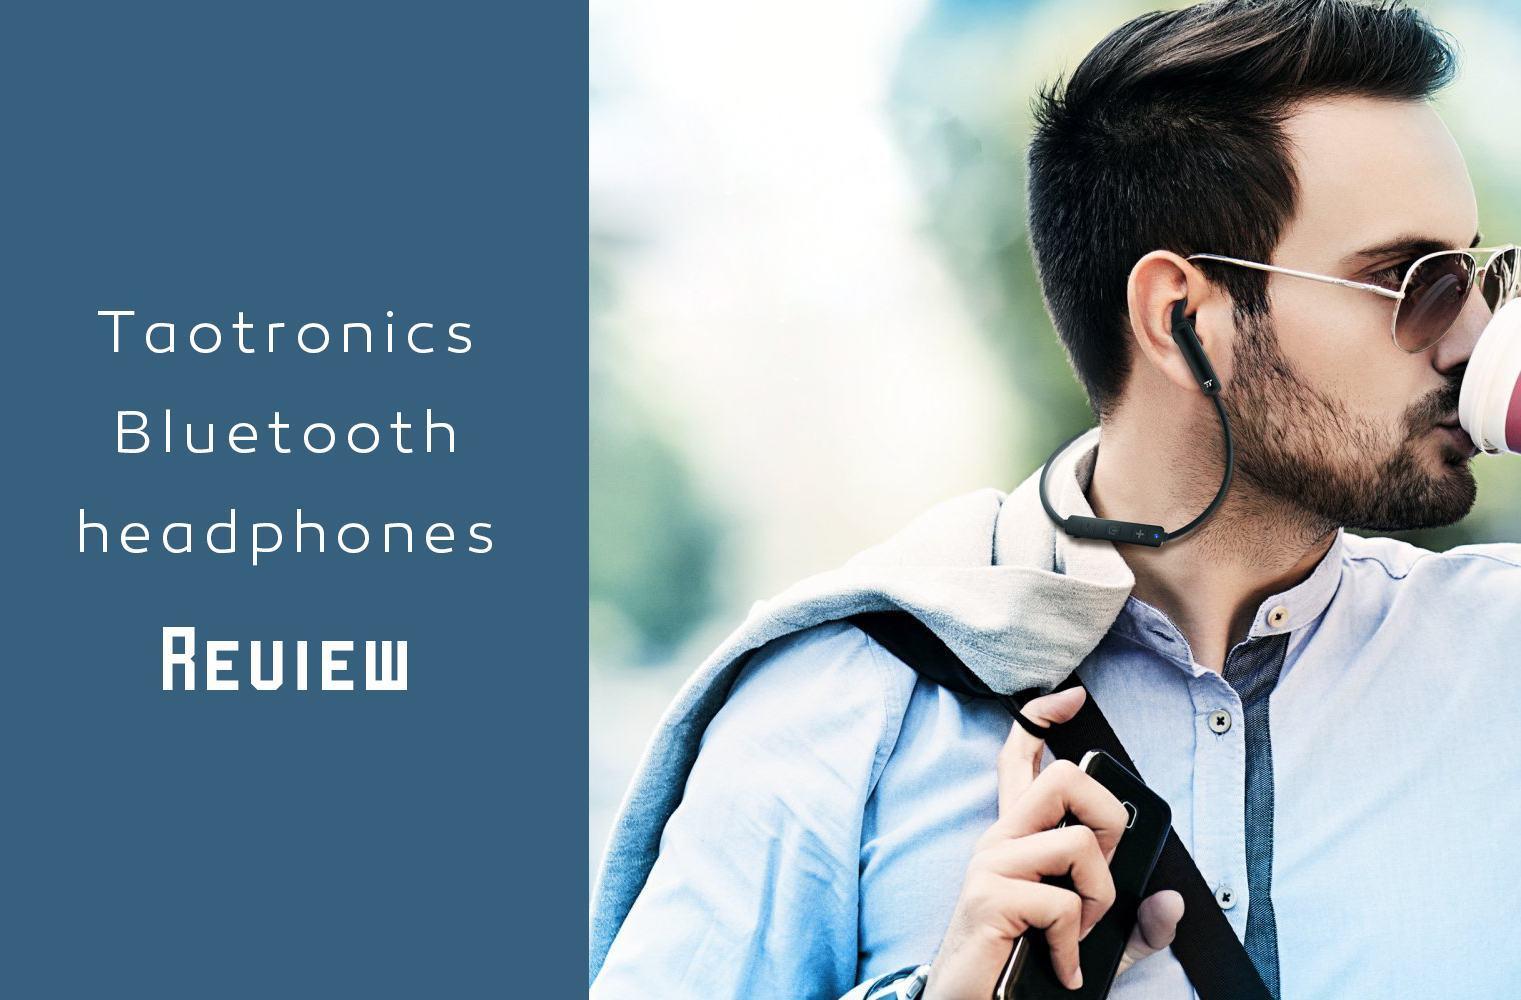 Taotronics Bluetooth headphones